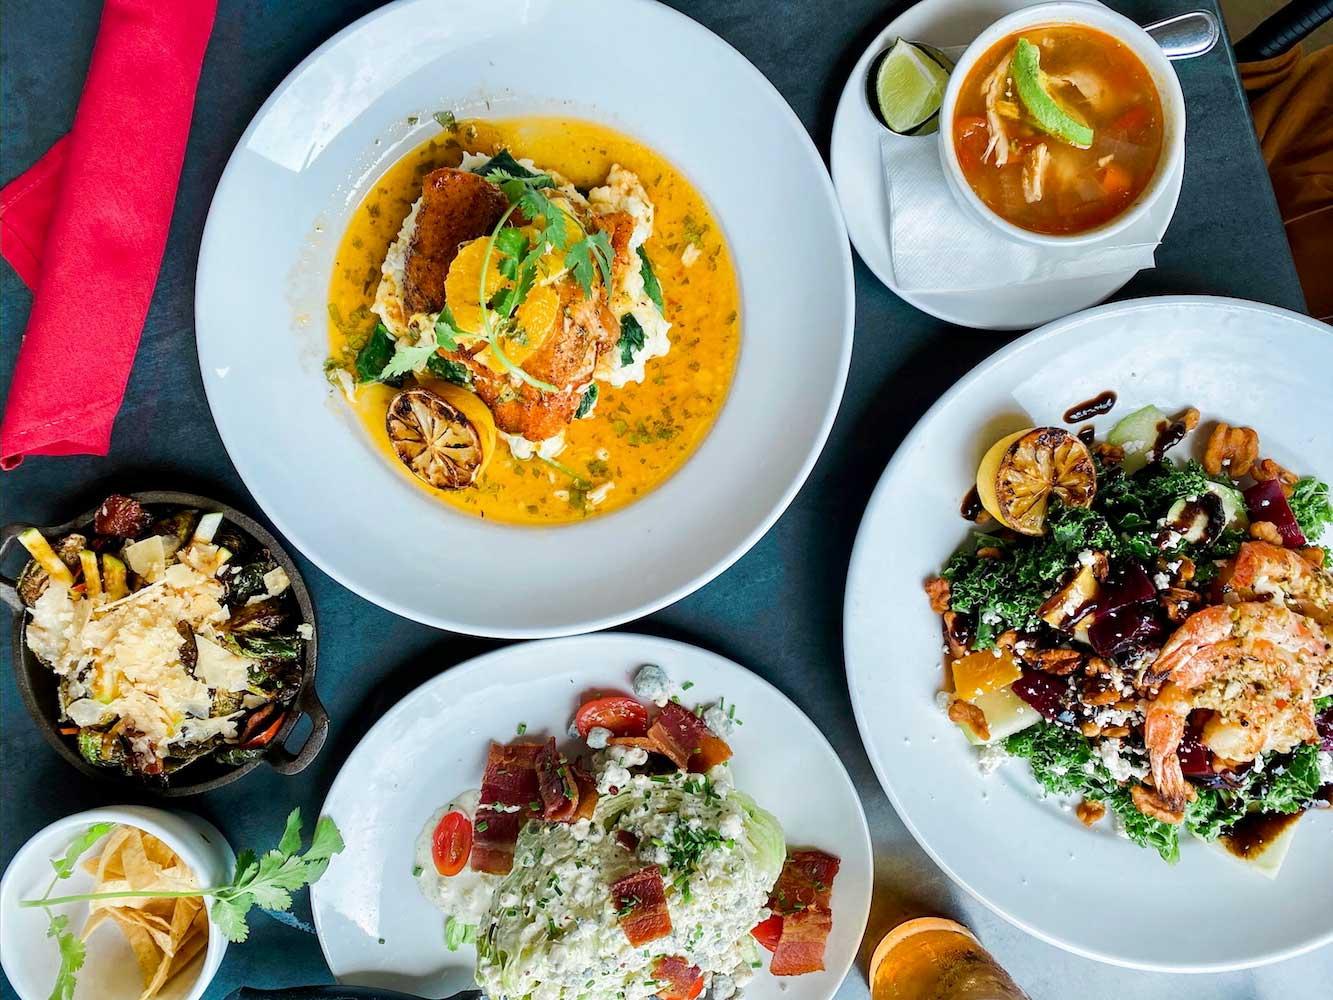 2020 Market Scr2020 Market Scratch Kitchen & Bar shrimp and saladatch Kitchen & Bar soup salad drinks